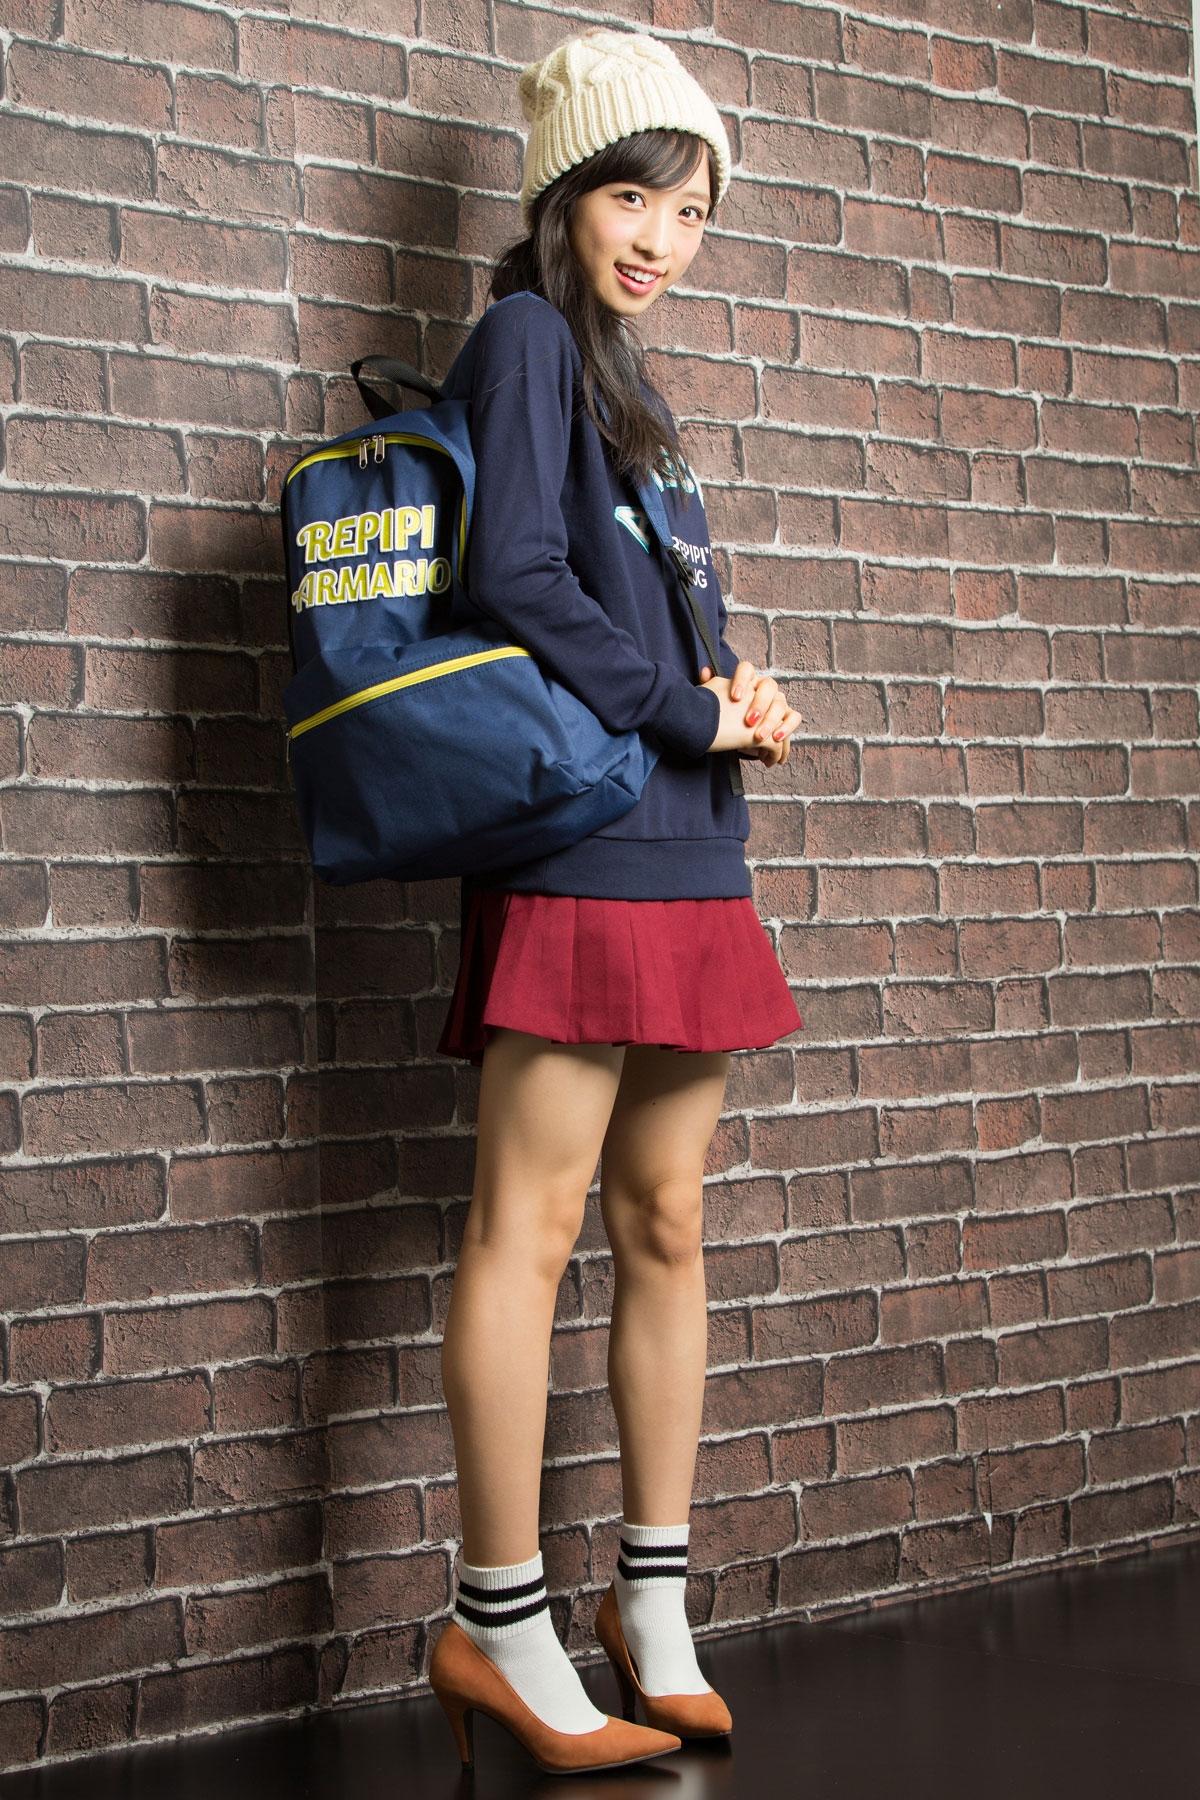 【JS】女子小学生 高学年画像スレPart42【JS】 [無断転載禁止]©bbspink.comfc2>1本 YouTube動画>2本 ->画像>6004枚